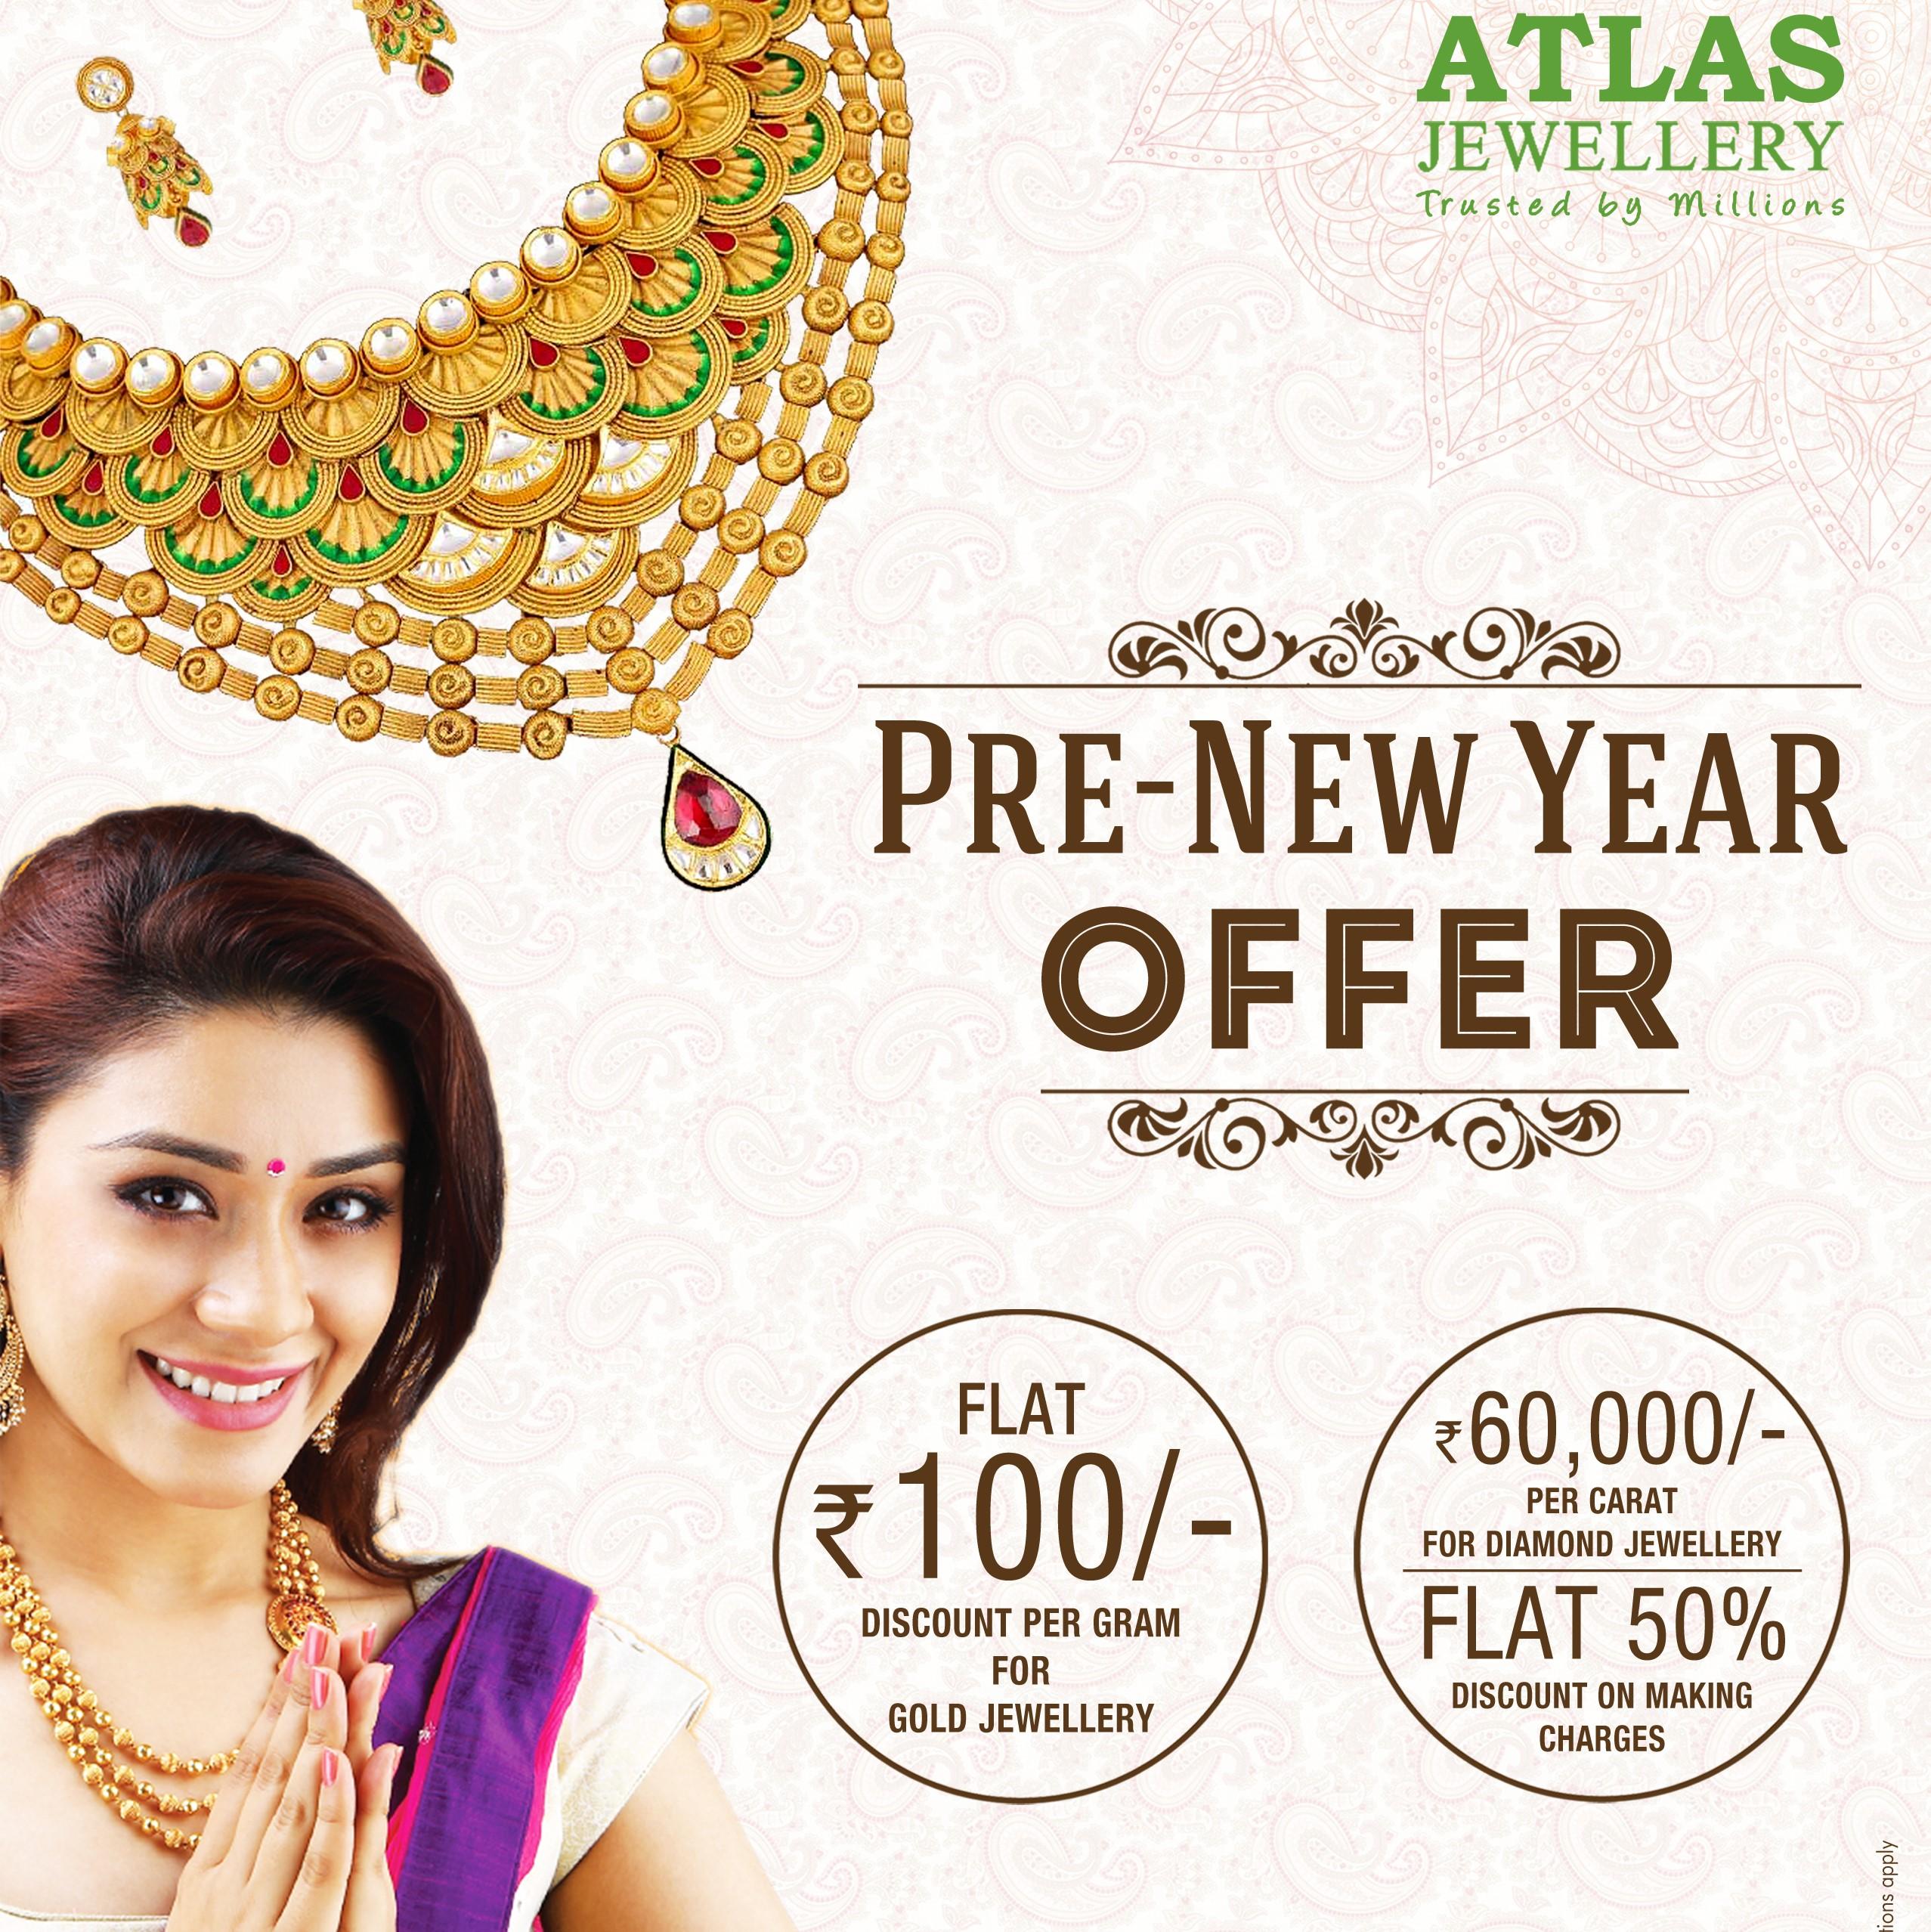 ATLAS Offers and News   Atlas Jewellery India Ltd